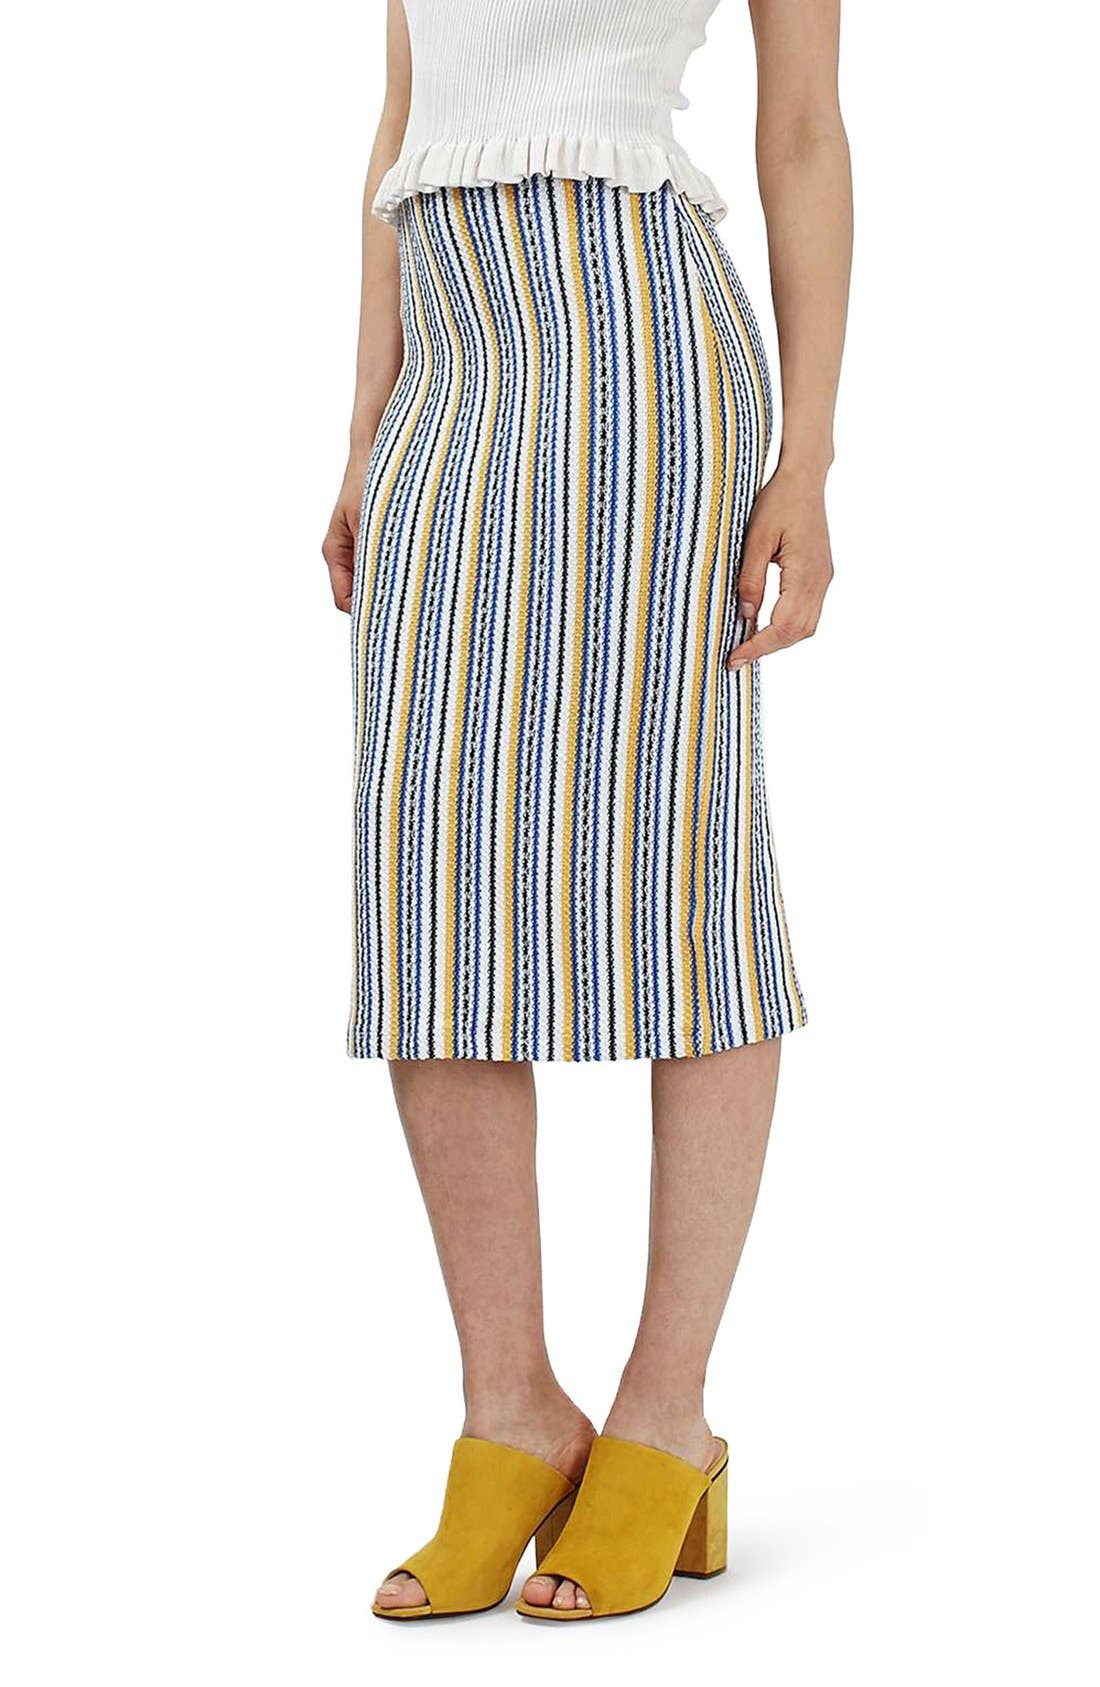 Main Image - Topshop 'Seaside' Striped Tube Skirt